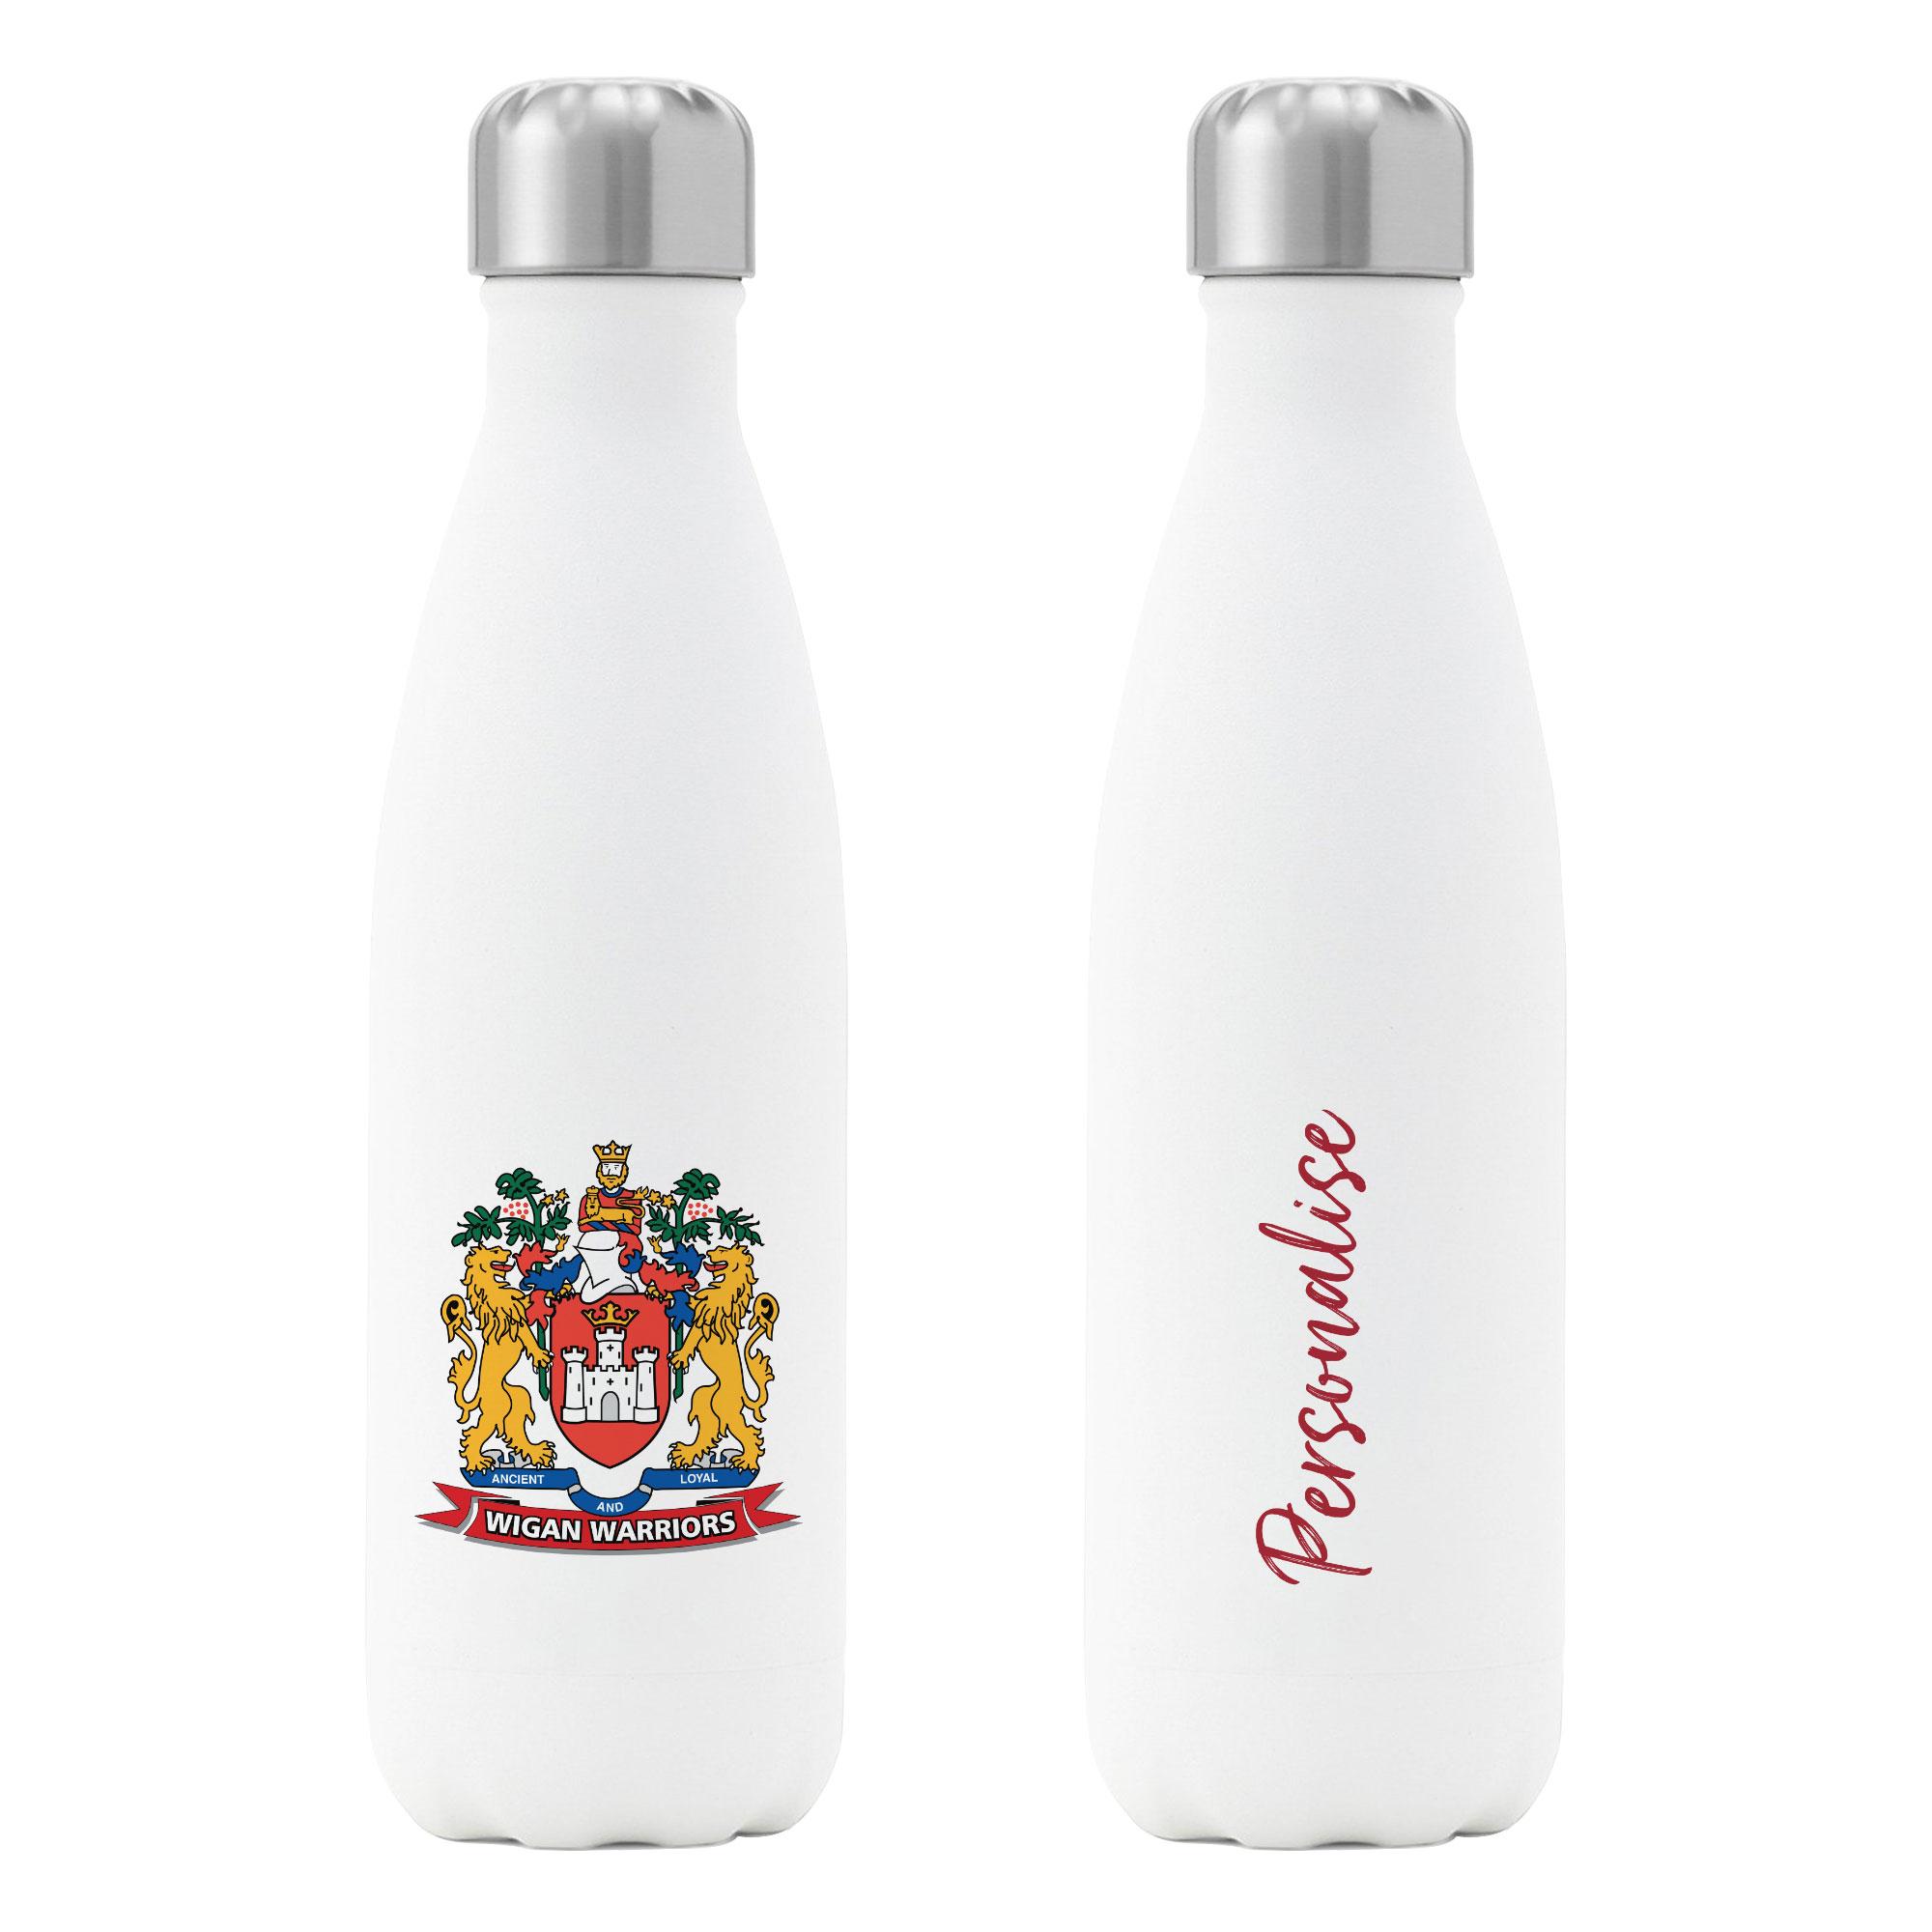 Wigan Warriors Crest Insulated Water Bottle - White